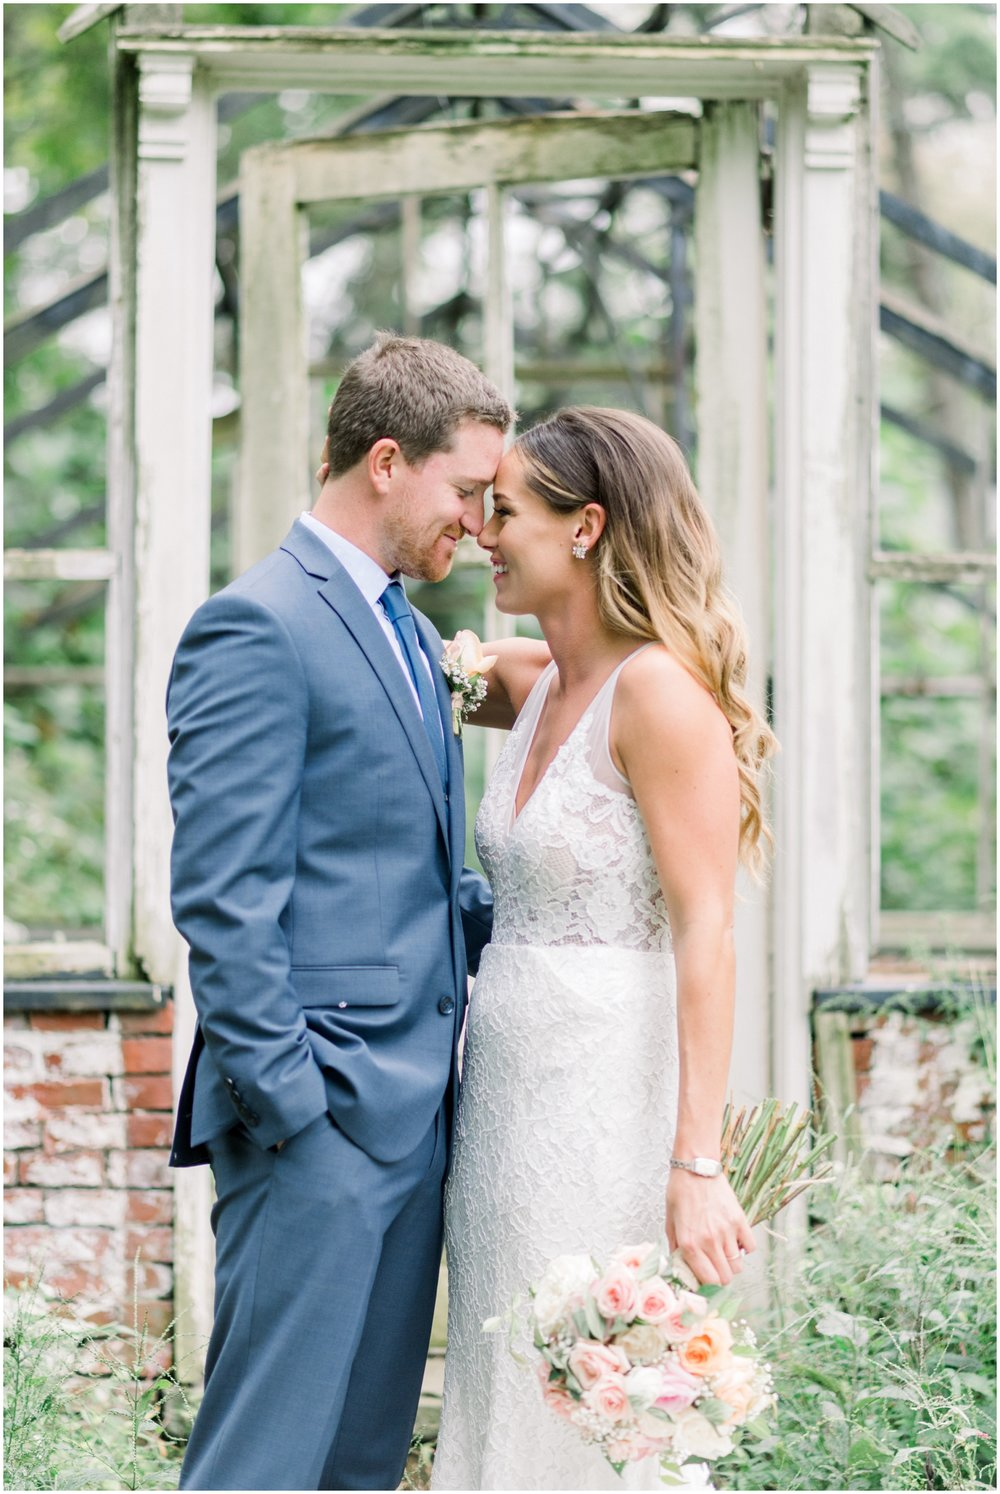 Summer Wedding at Philander Chase Knox Estate in Malvern, PA - Krista Brackin Photography_0057.jpg